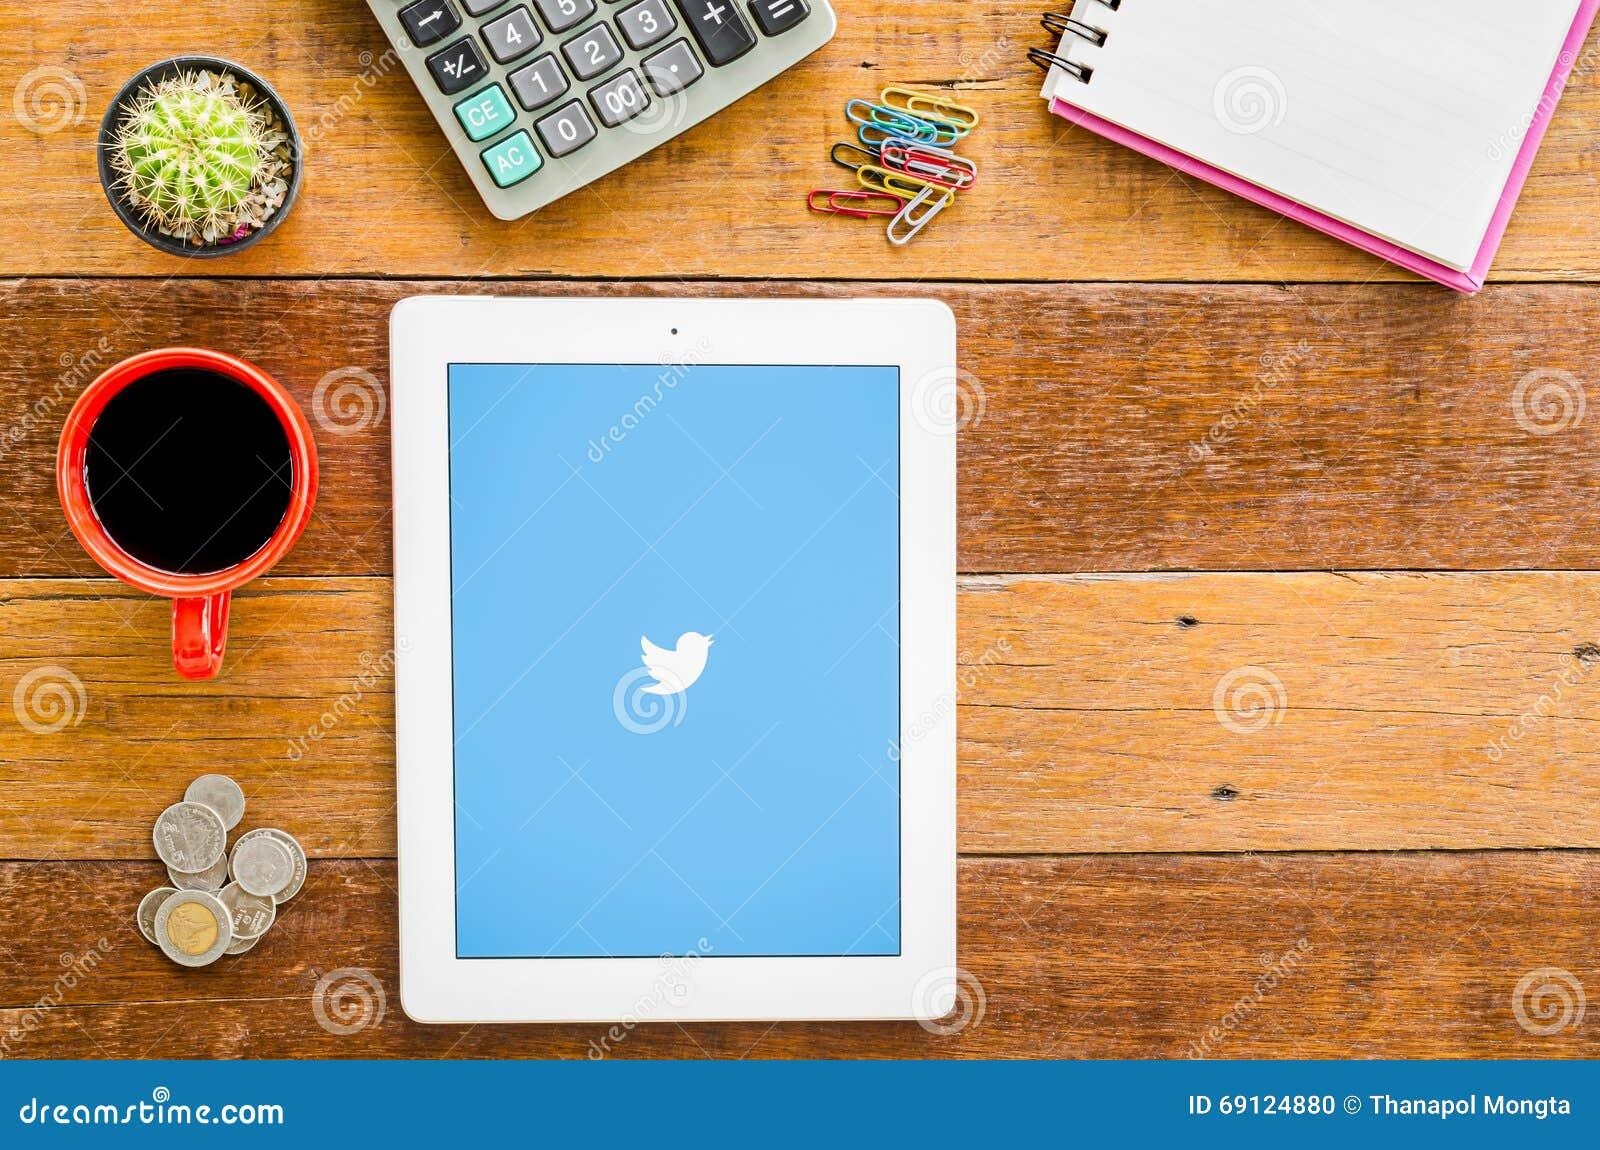 IPad 4 open Twitter application